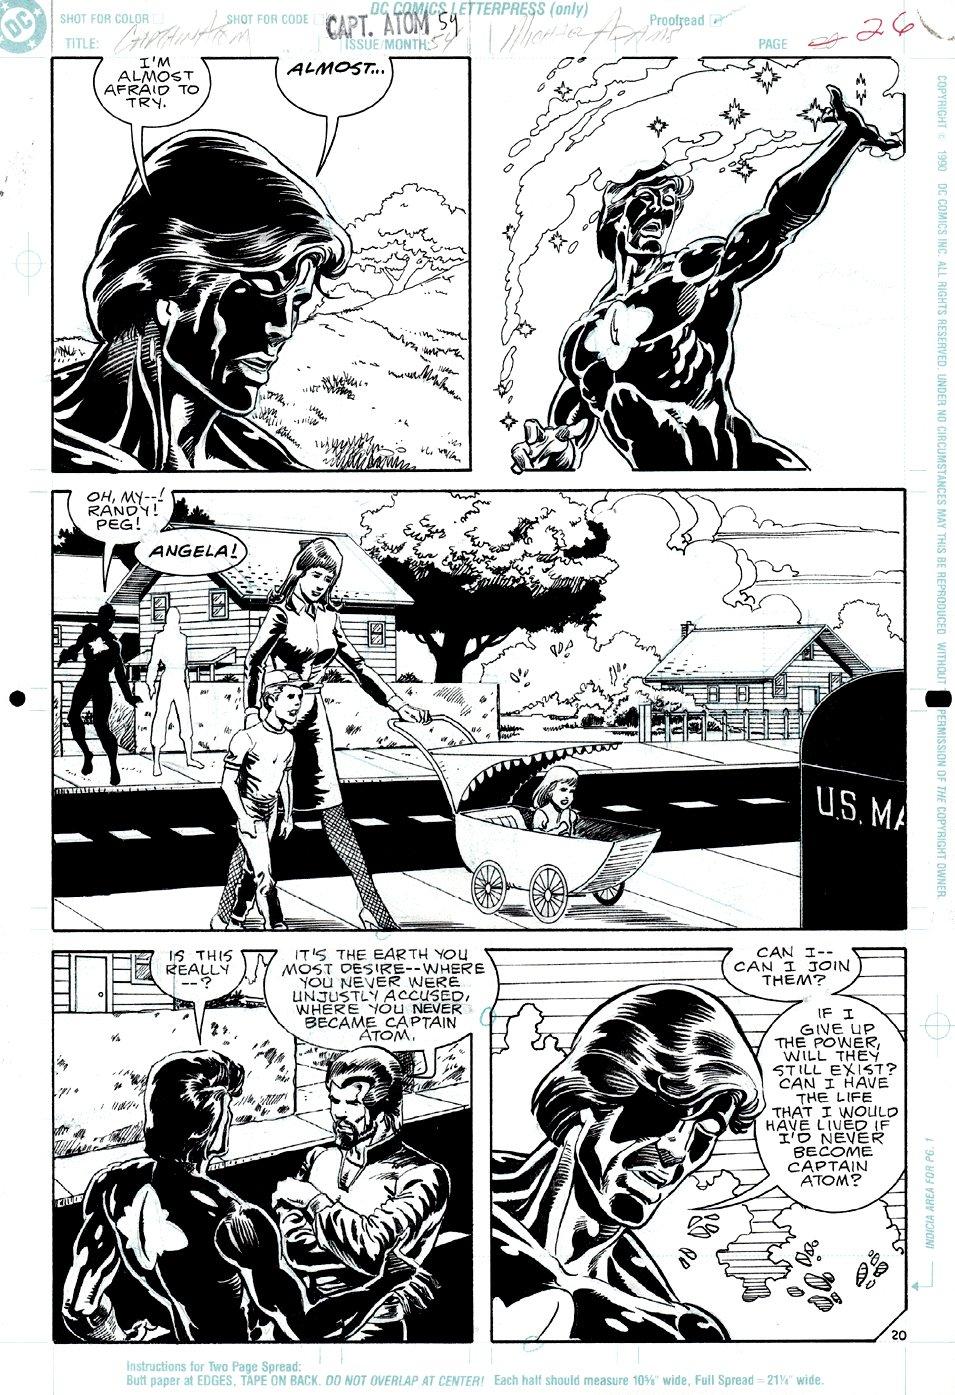 Captain Atom #54 p 20 (Captain Atom In EVERY PANEL!) 1991